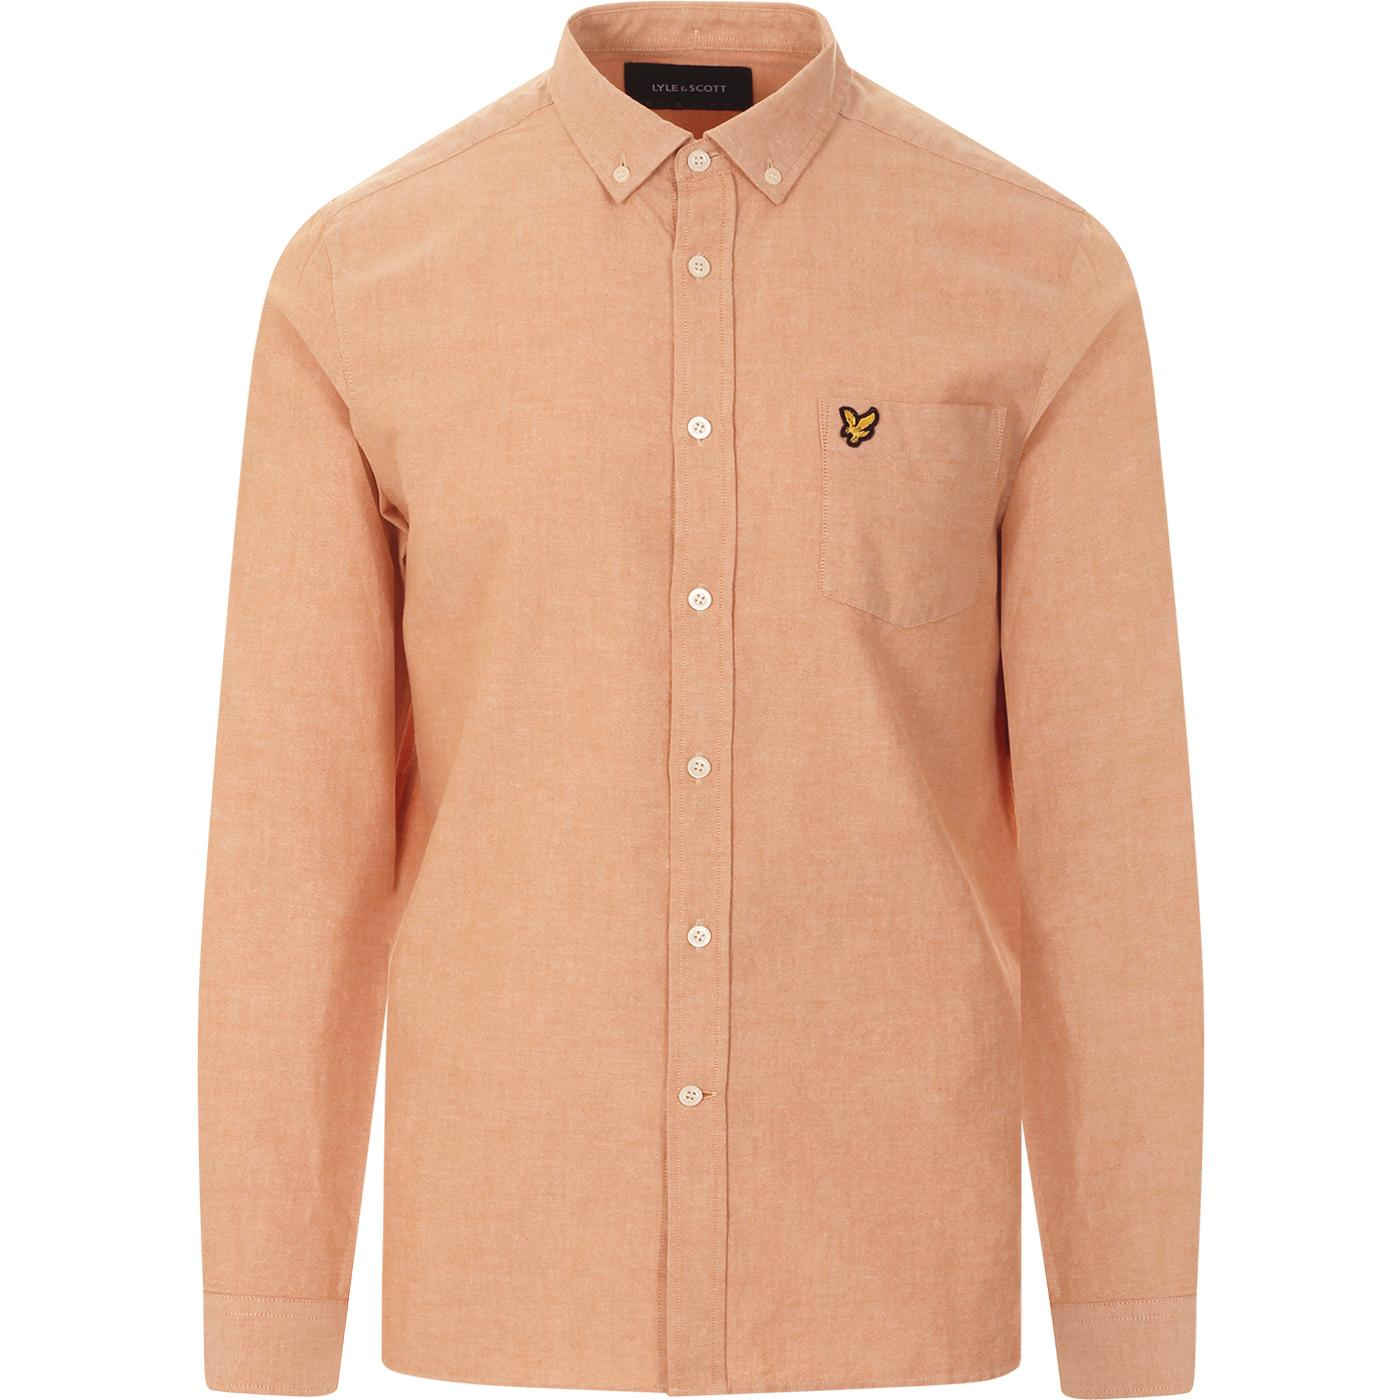 LYLE & SCOTT Button Down Oxford Shirt (Sunflower)